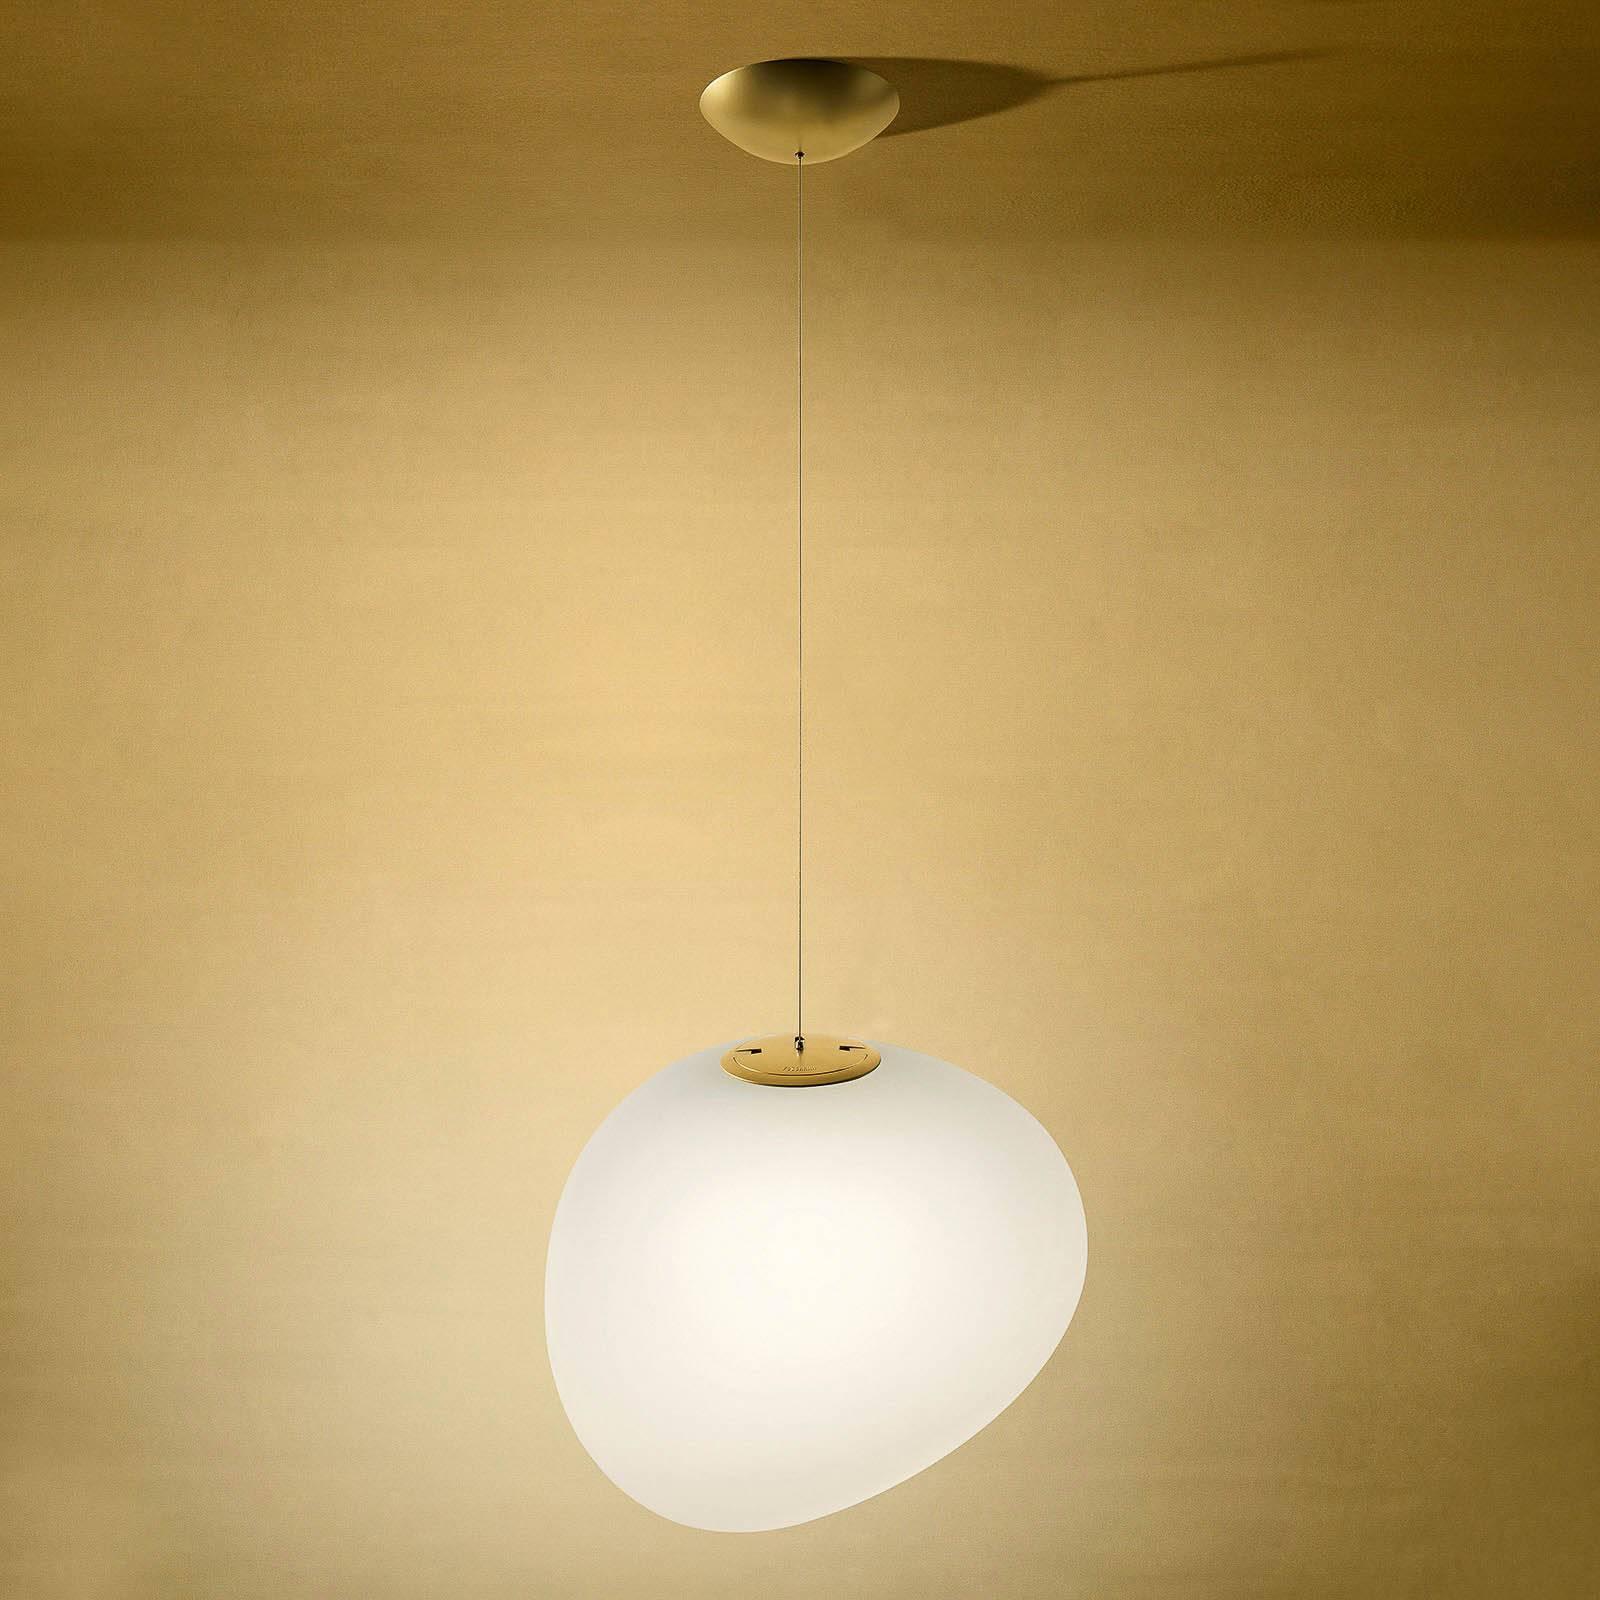 Foscarini Gregg midi LED-Hängeleuchte, gold